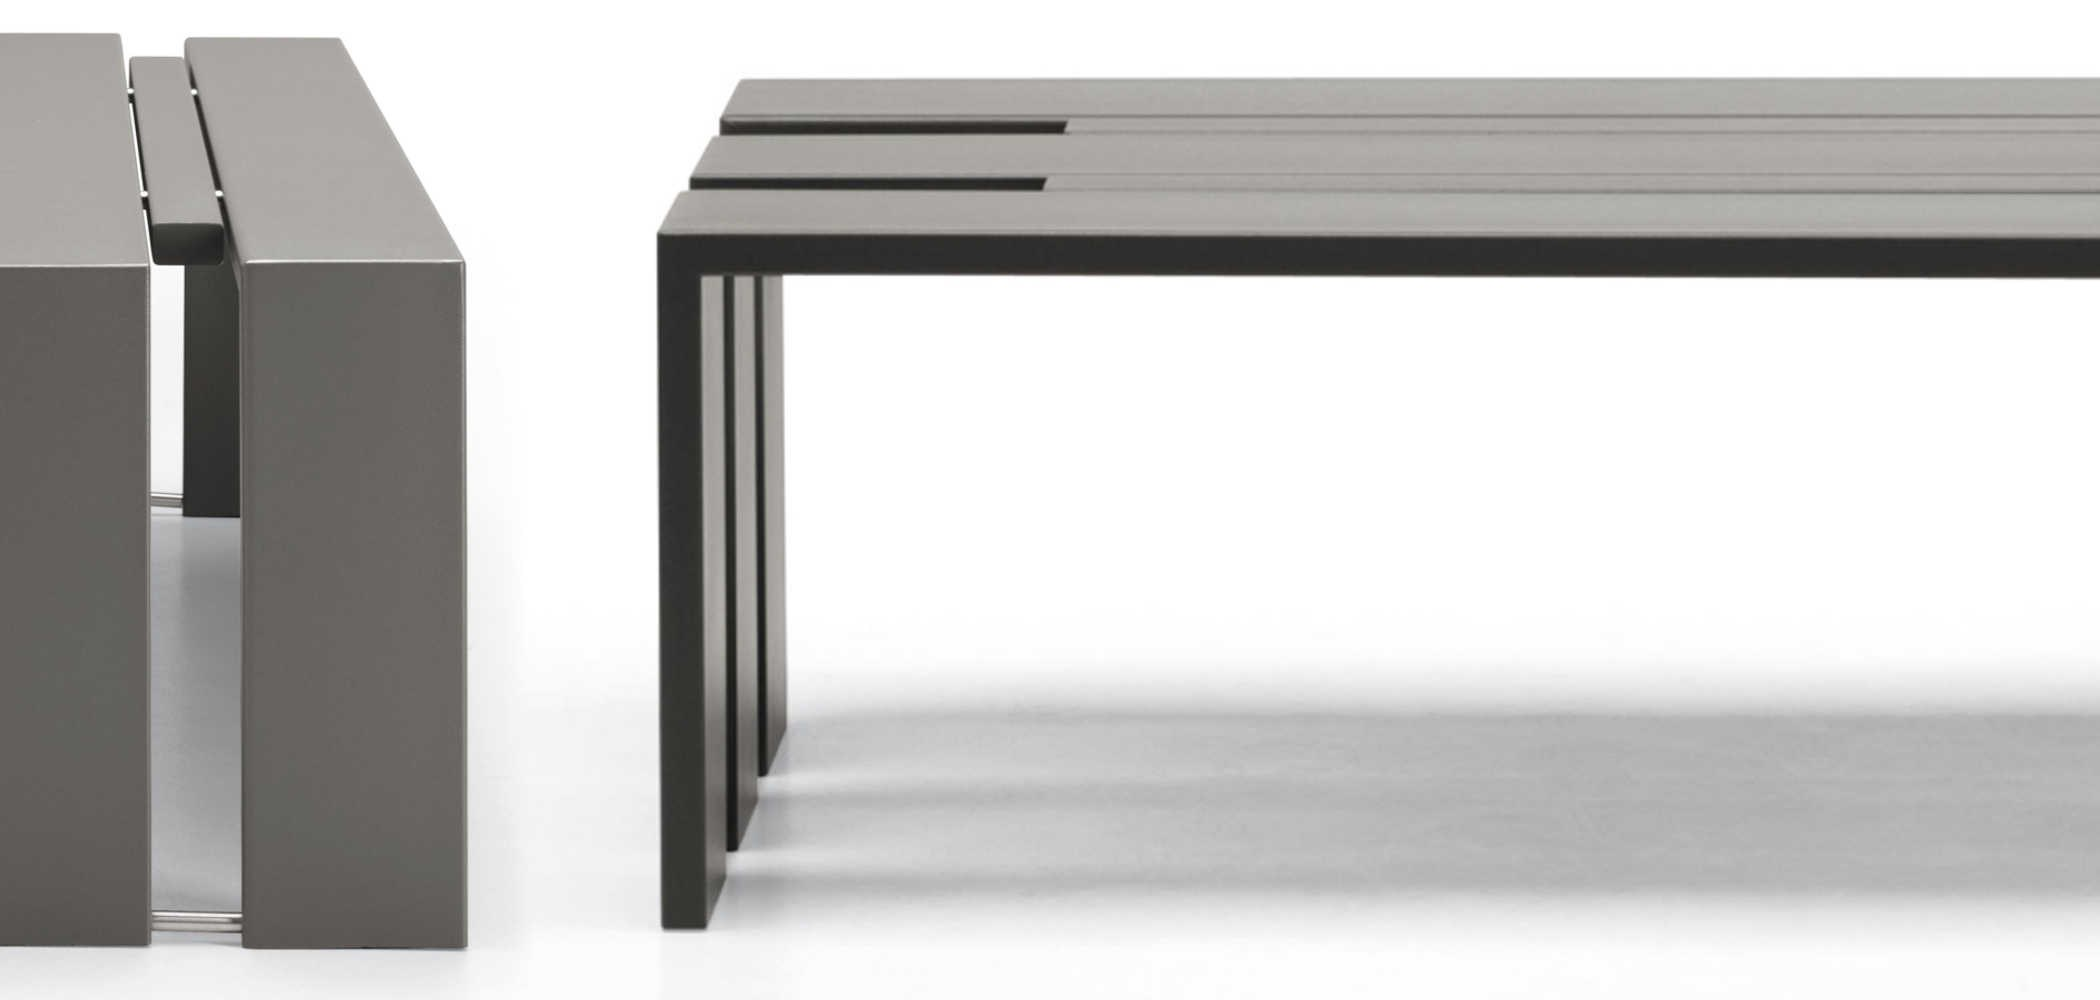 banc en acier sans dossier toso by metalco design pio. Black Bedroom Furniture Sets. Home Design Ideas